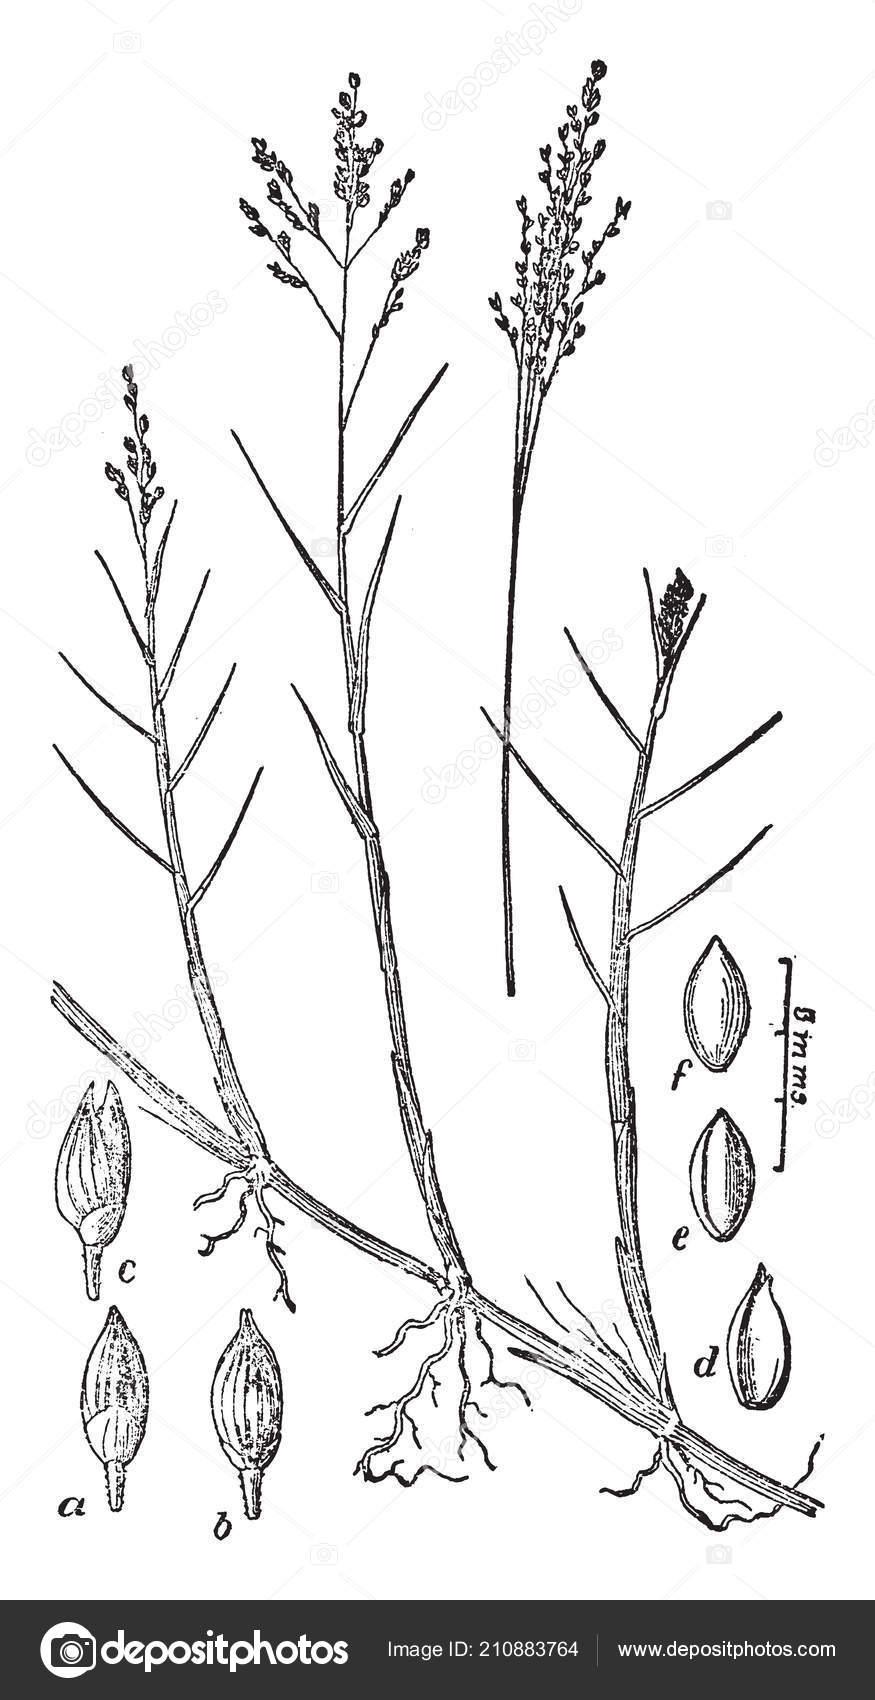 medium resolution of diagram pedaium stem which showing transverse section stem vintage line stock illustration